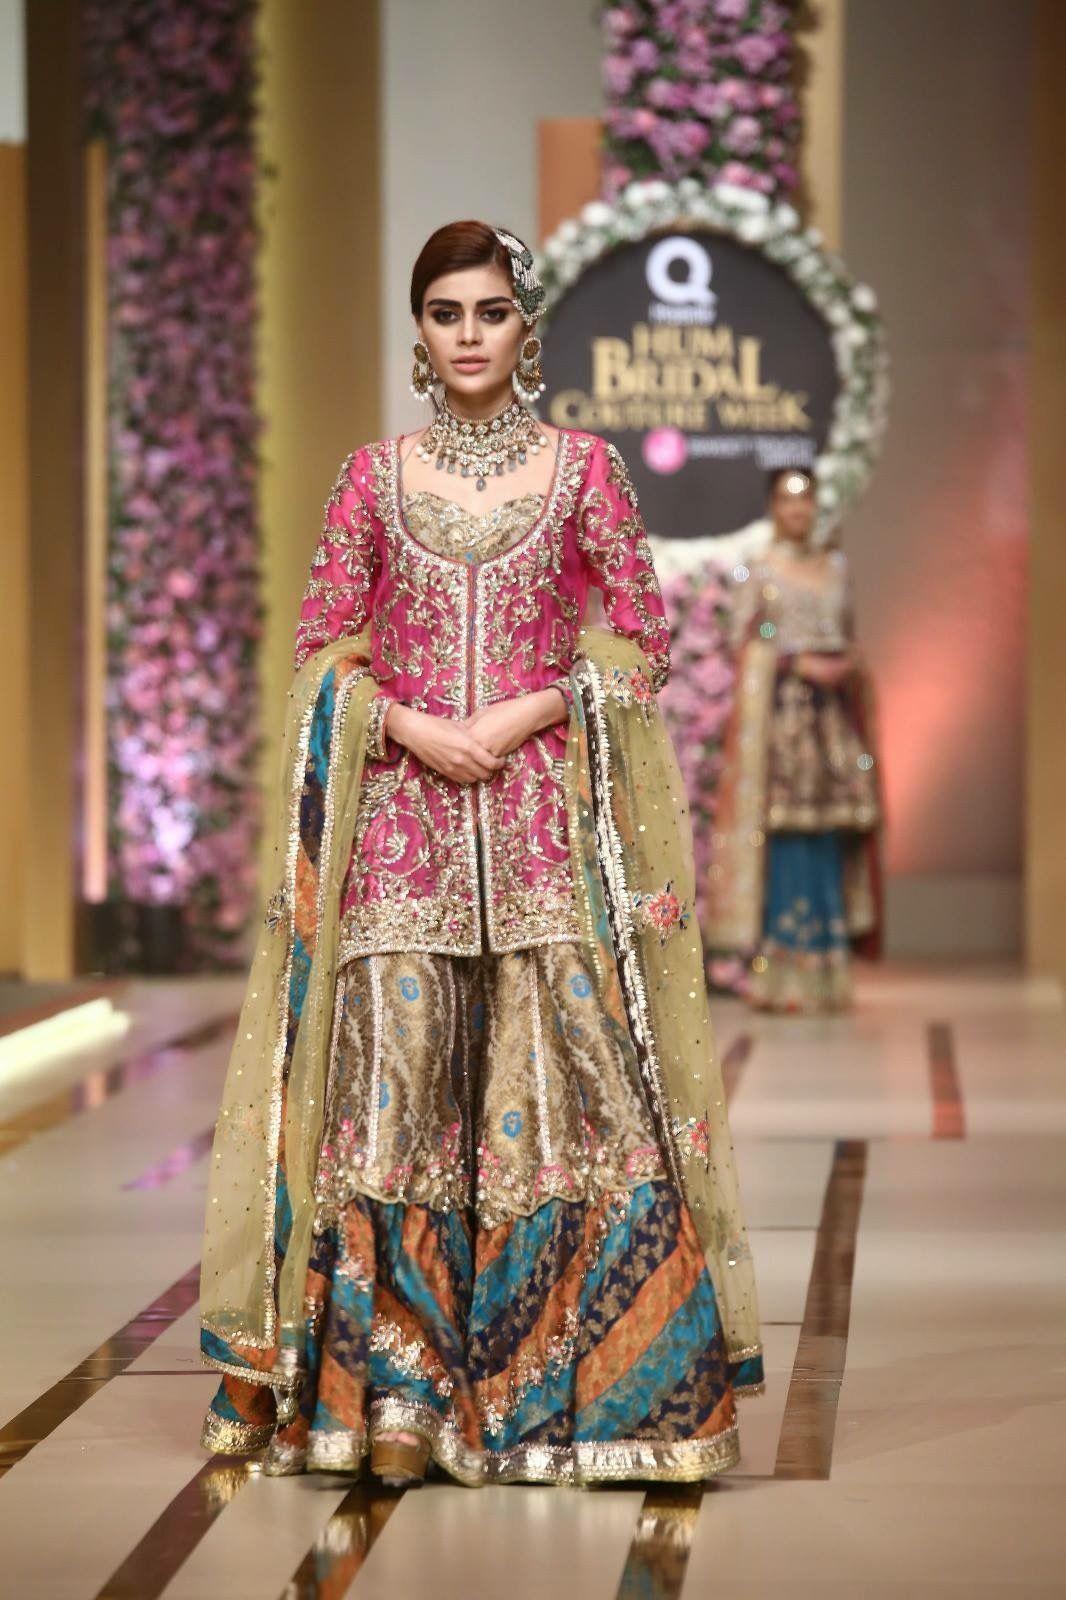 7b1f65e2ab4d8d Chatapati gharara Pakistani Mehndi Dress, Pakistani Bridal Couture,  Pakistani Wedding Outfits, Pakistani Bridal